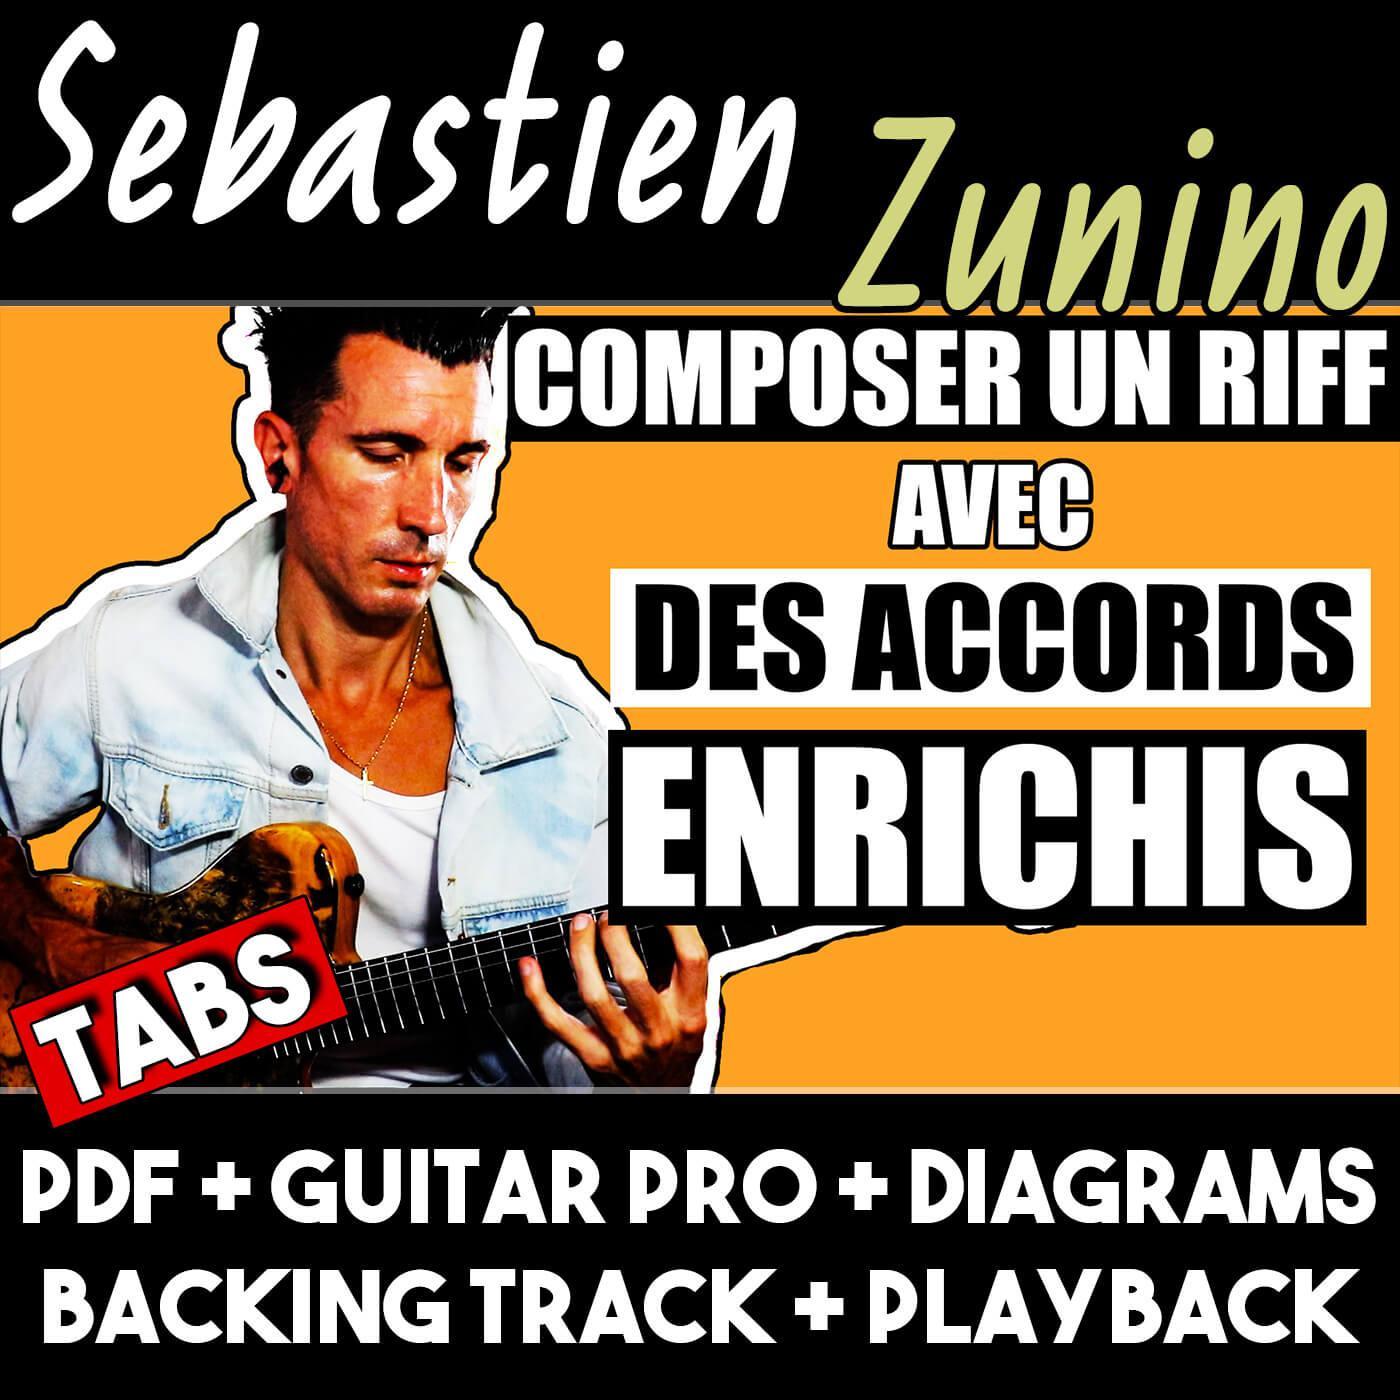 Produit riff accords enrichis 1